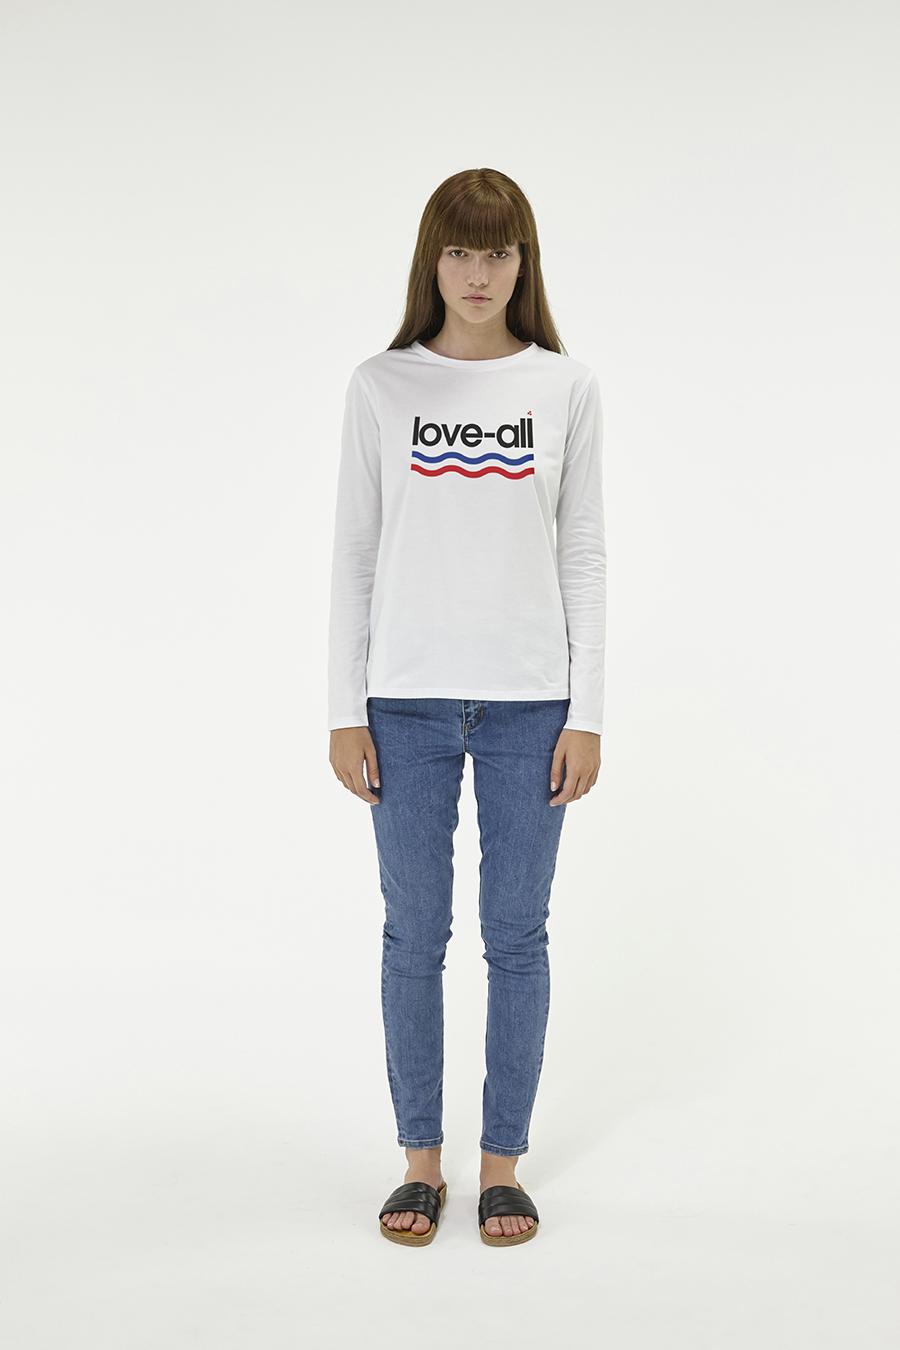 Huffer_Q3-16_W-LS-Avenue-LOVE-ALL_White-01